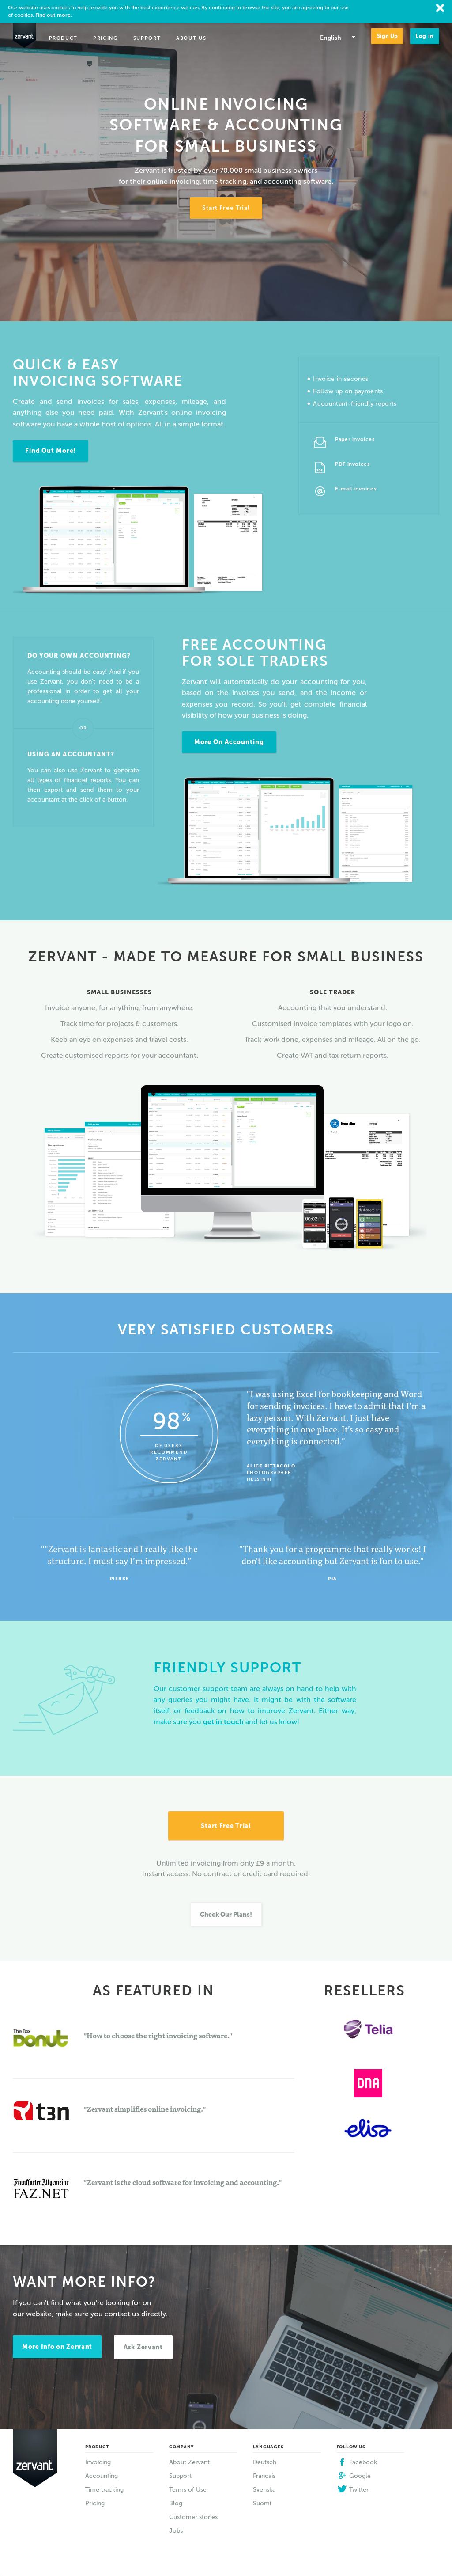 Zervant Competitors, Revenue and Employees - Owler Company Profile